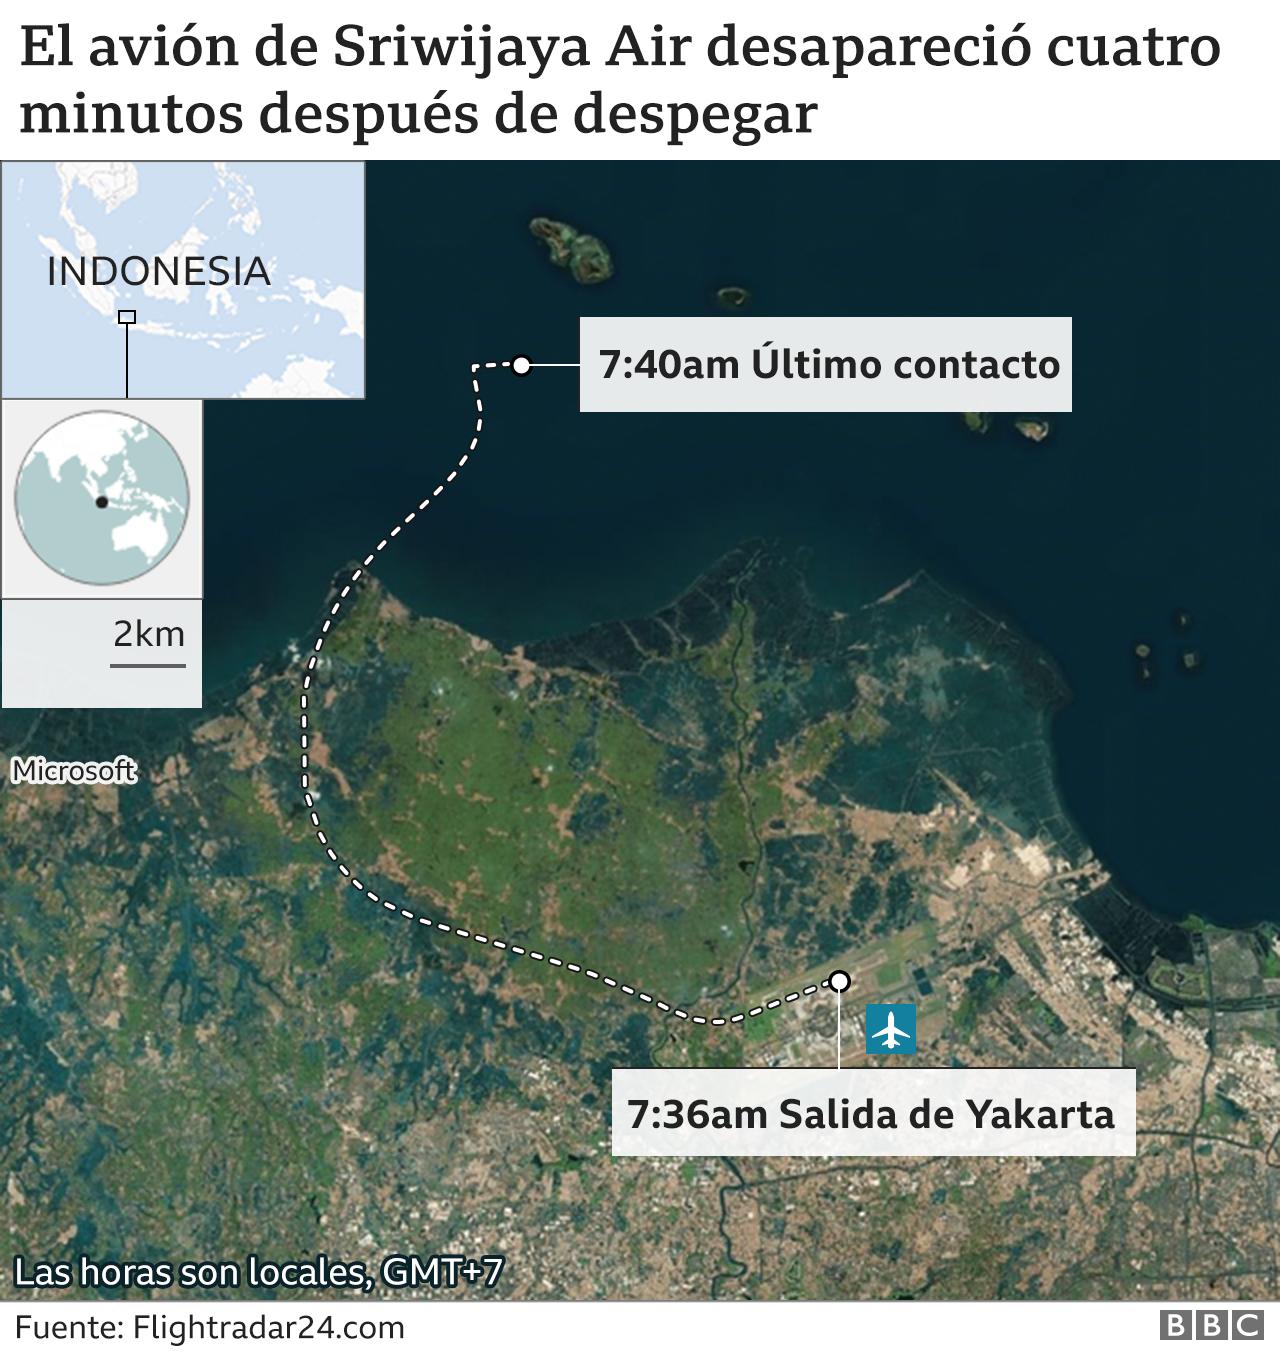 Mapa de avión desaparecido.